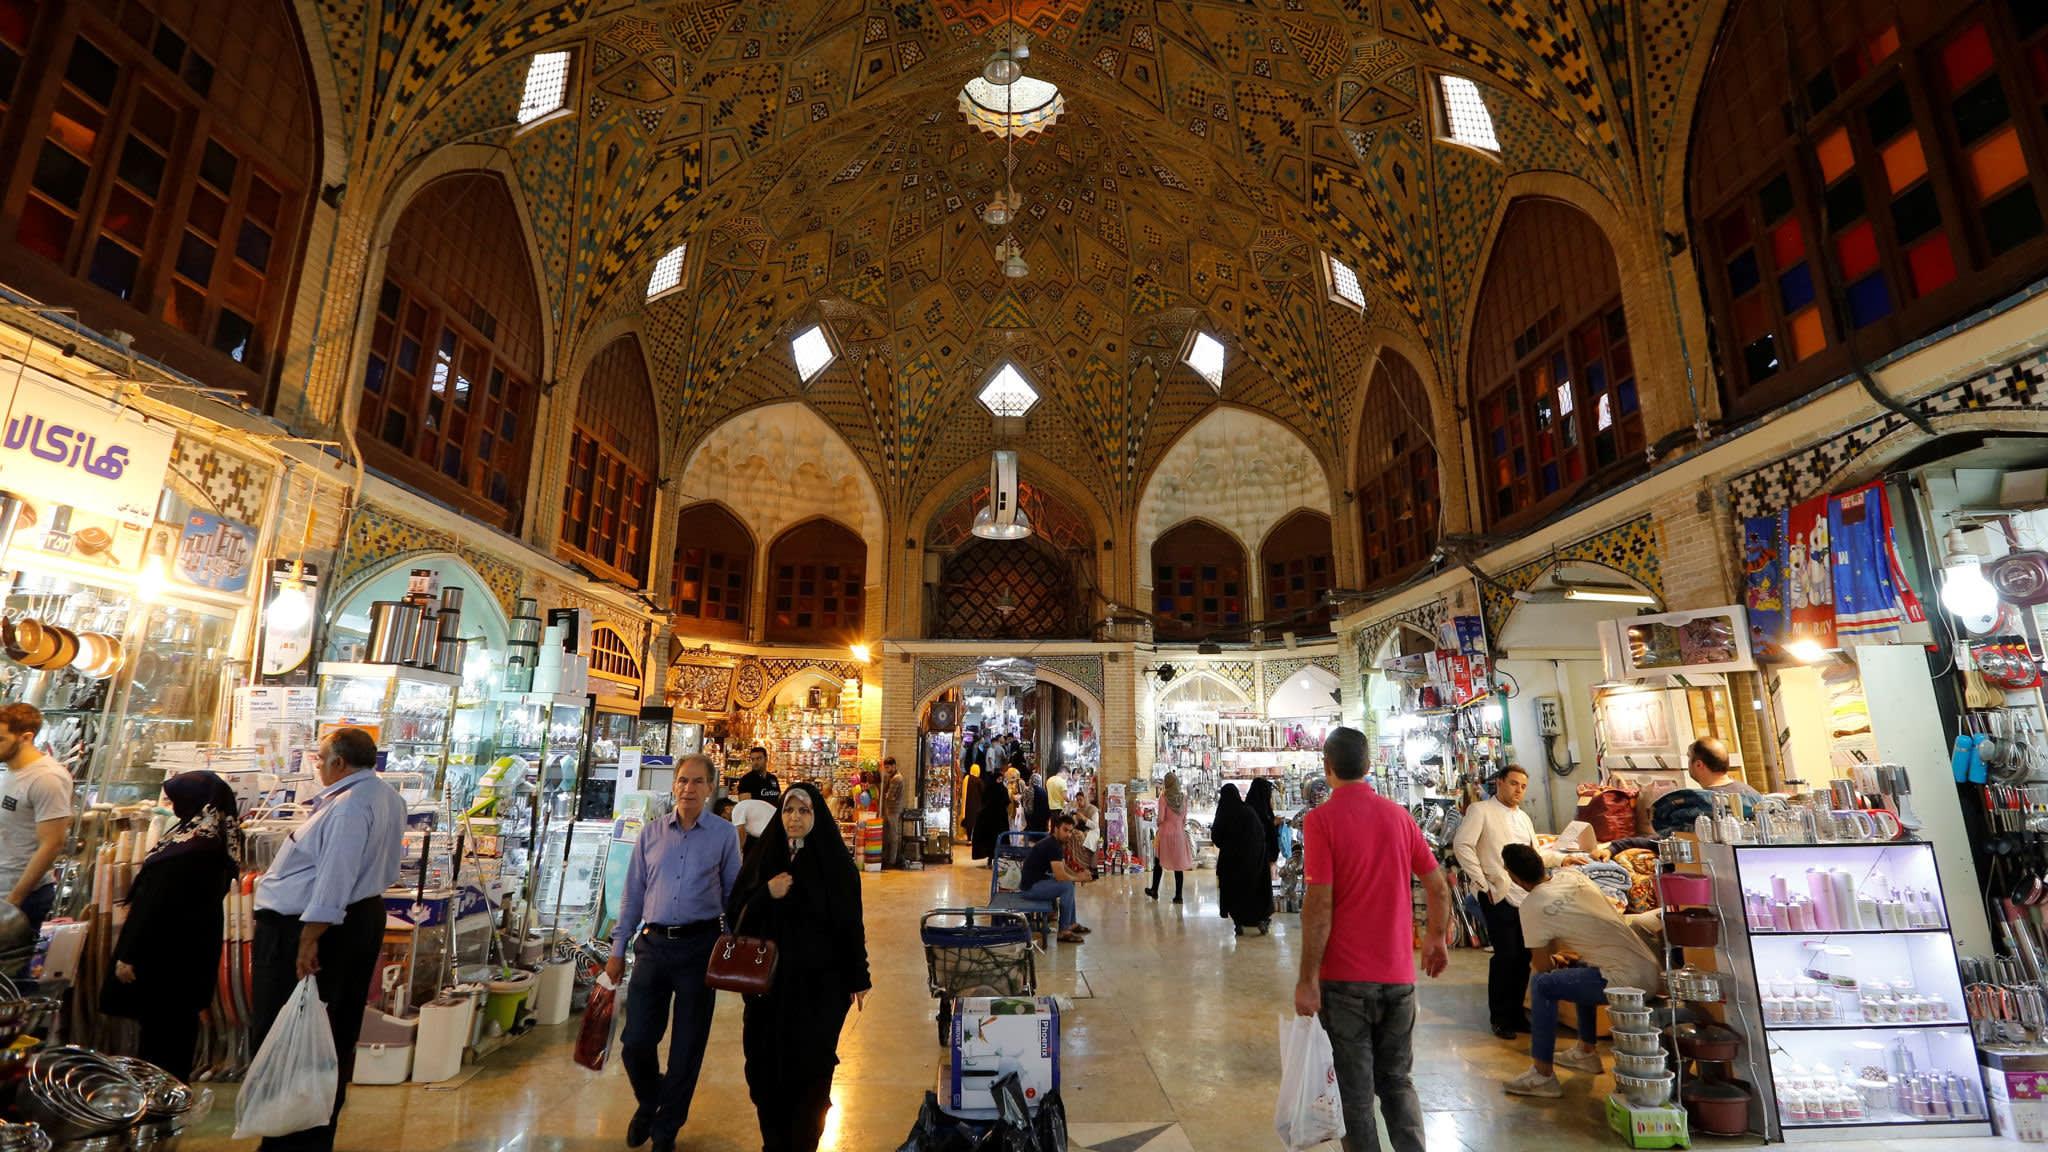 Mistrust infects Iran's bazaars as sanctions bite